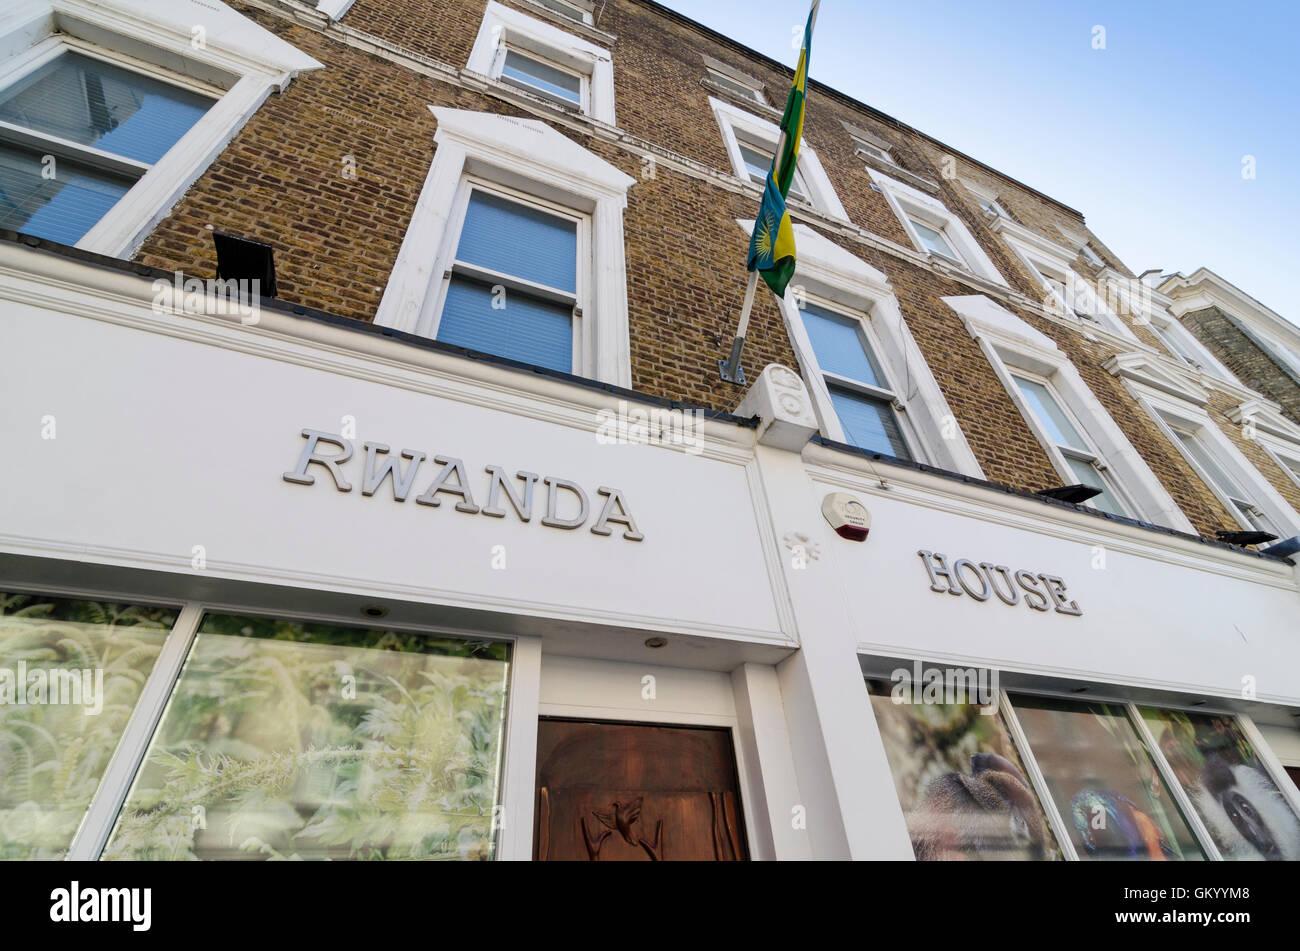 Rwanda House, London, UK - Stock Image